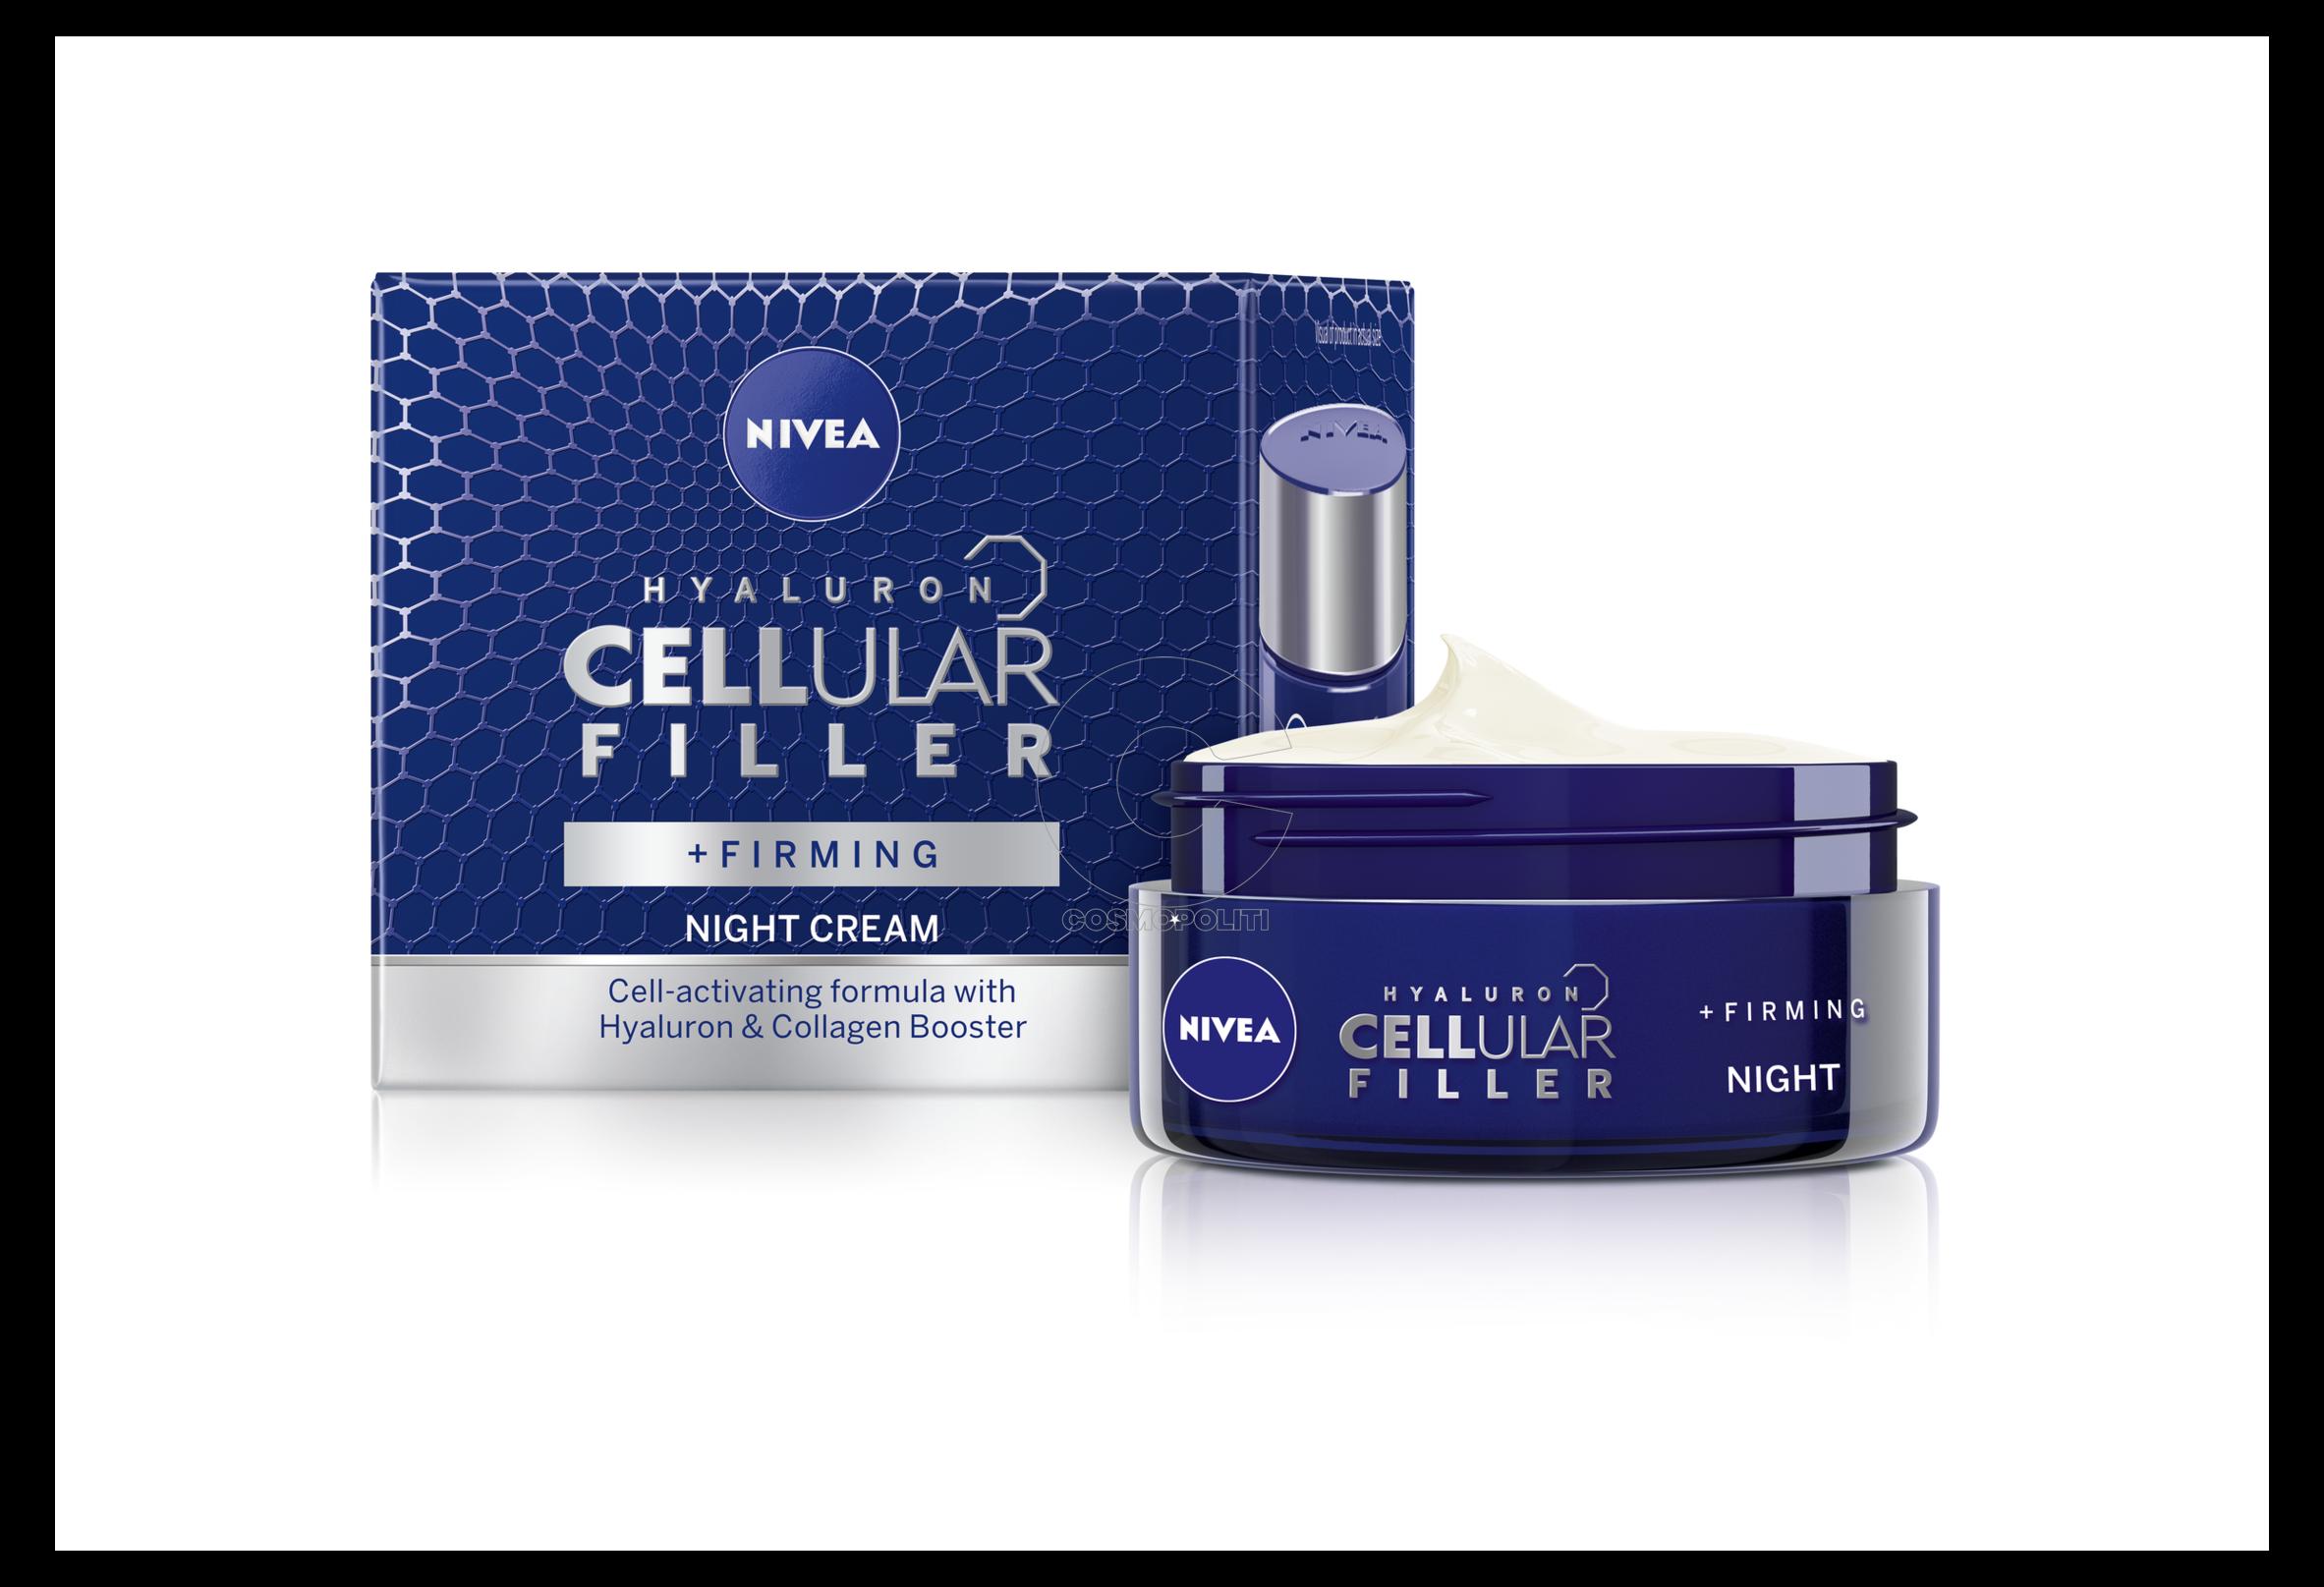 Cellular_HyaluronFiller_Firming_NightCream